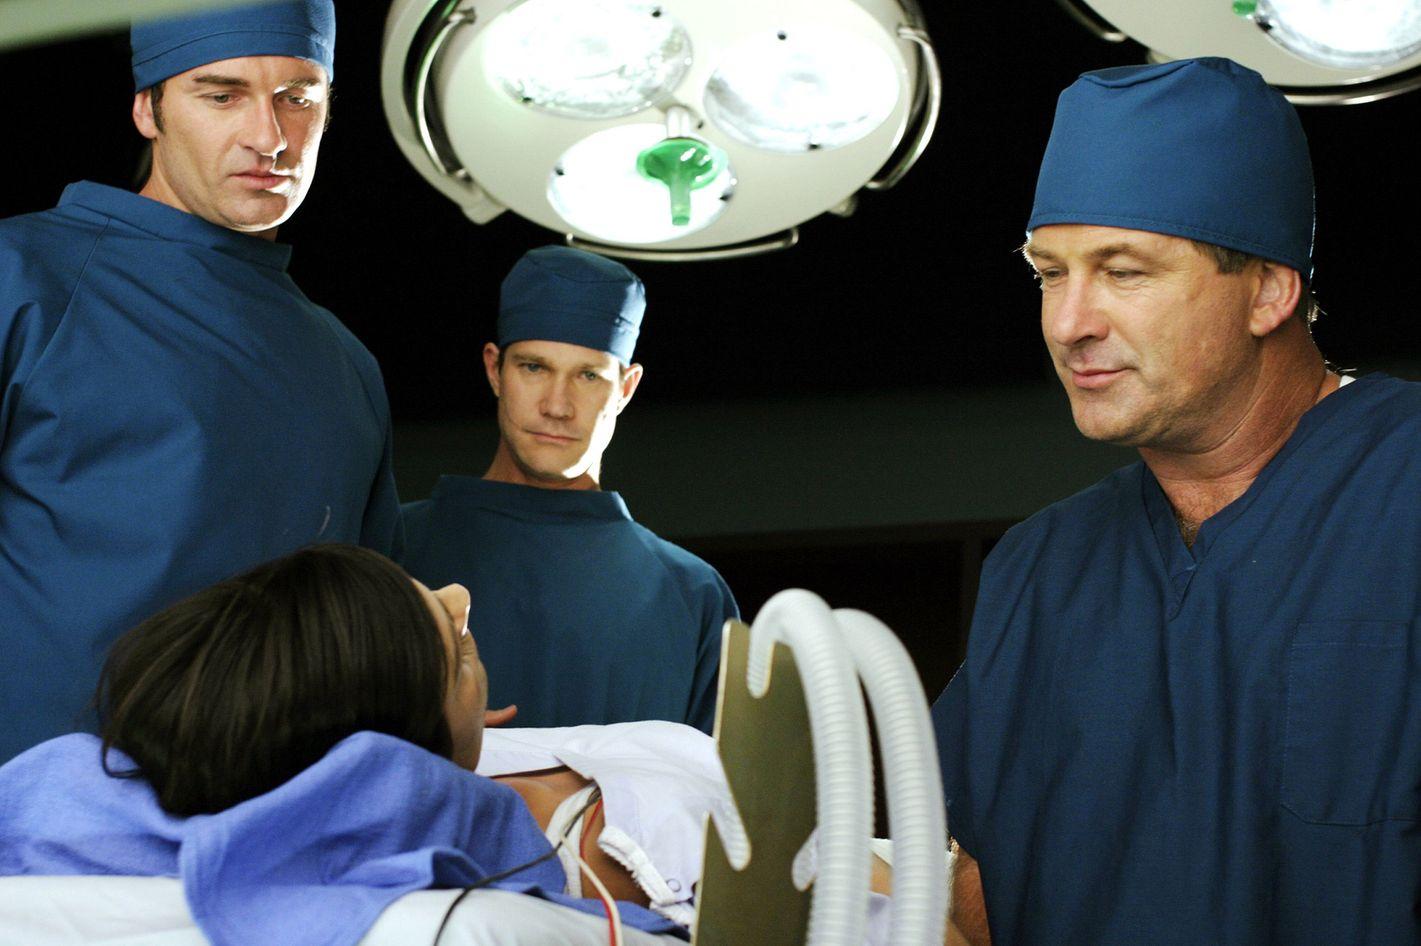 Medical Baby Dummy Giant Size Hospital Carry On Surgeon